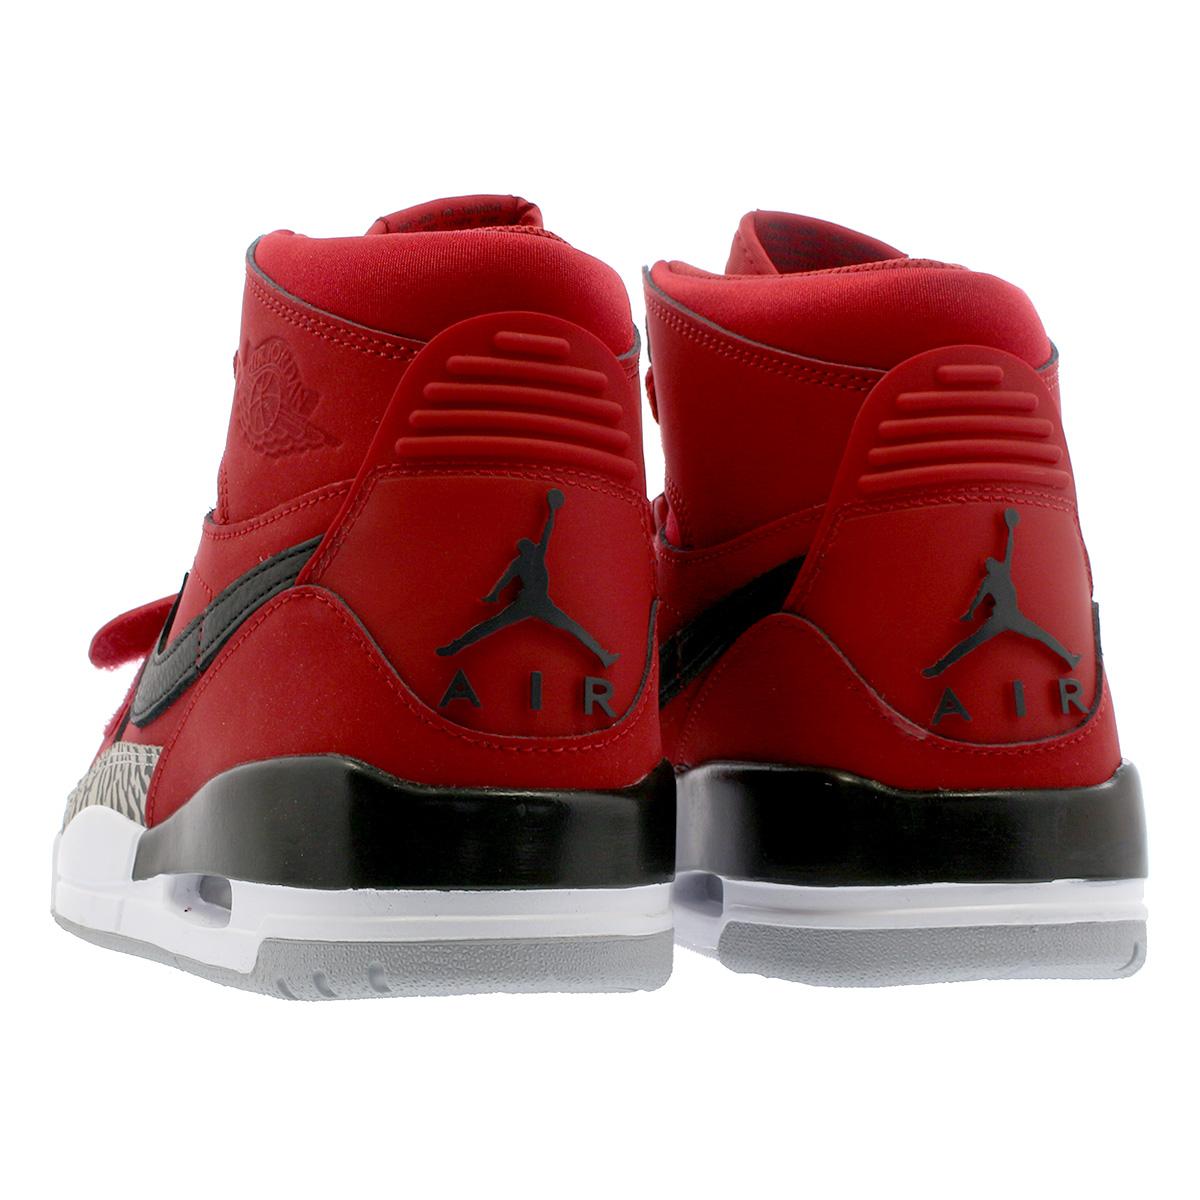 e39b67068f5d8e NIKE AIR JORDAN LEGACY 312 Nike Air Jordan Legacy 312 VARSITY RED BLACK WHITE  av3922-601